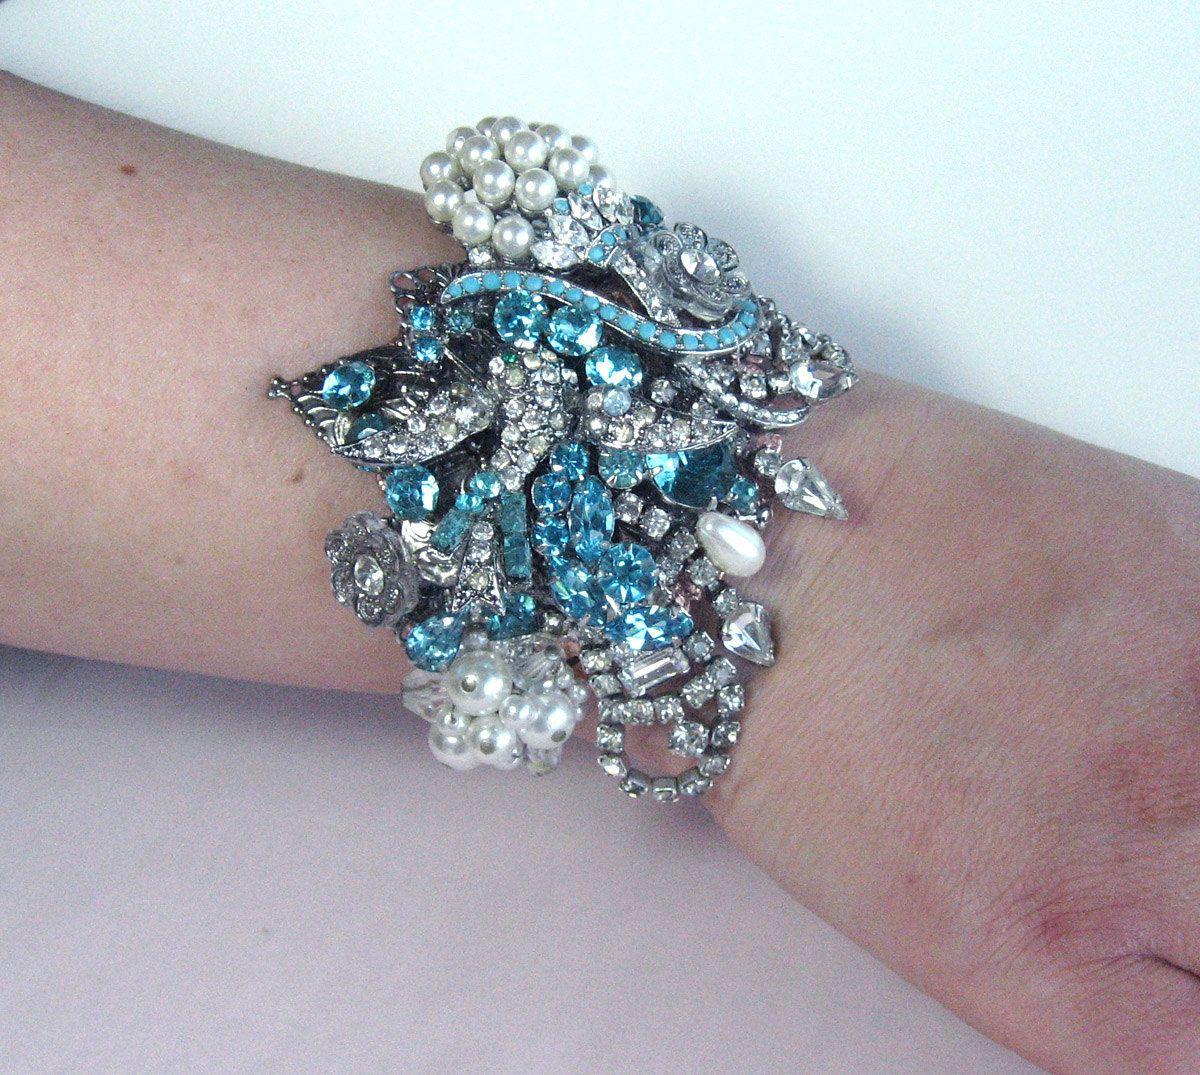 Gorgeous Aquamarine Blue Rhinestone Wedding Bracelet Cuff From Vintage Jewels. $175.00, via Etsy.